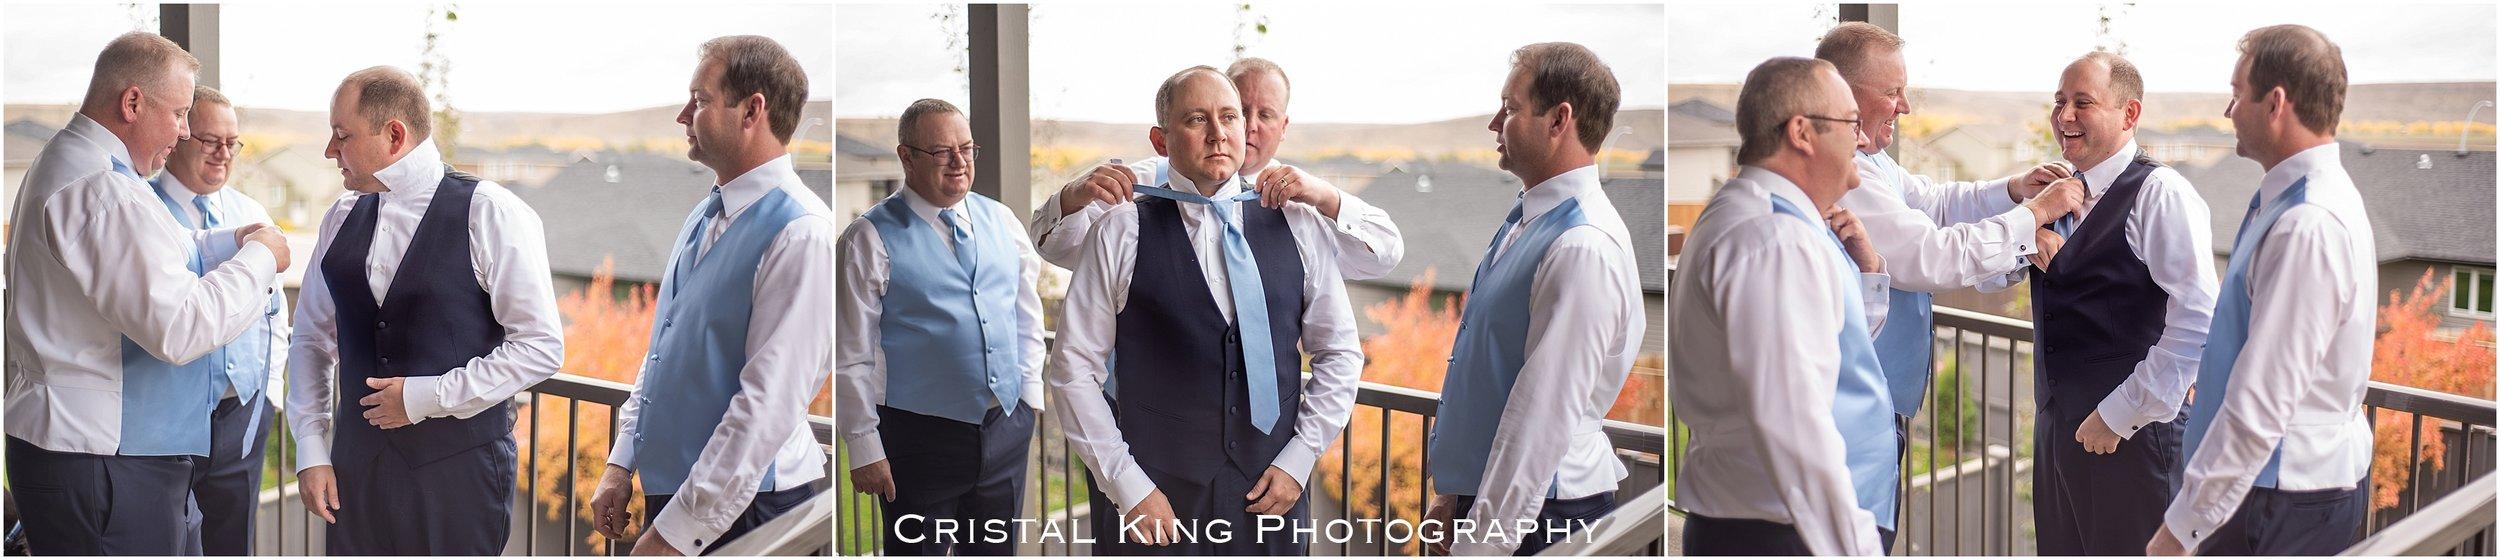 Quynh-Scotts-Wedding-20.jpg